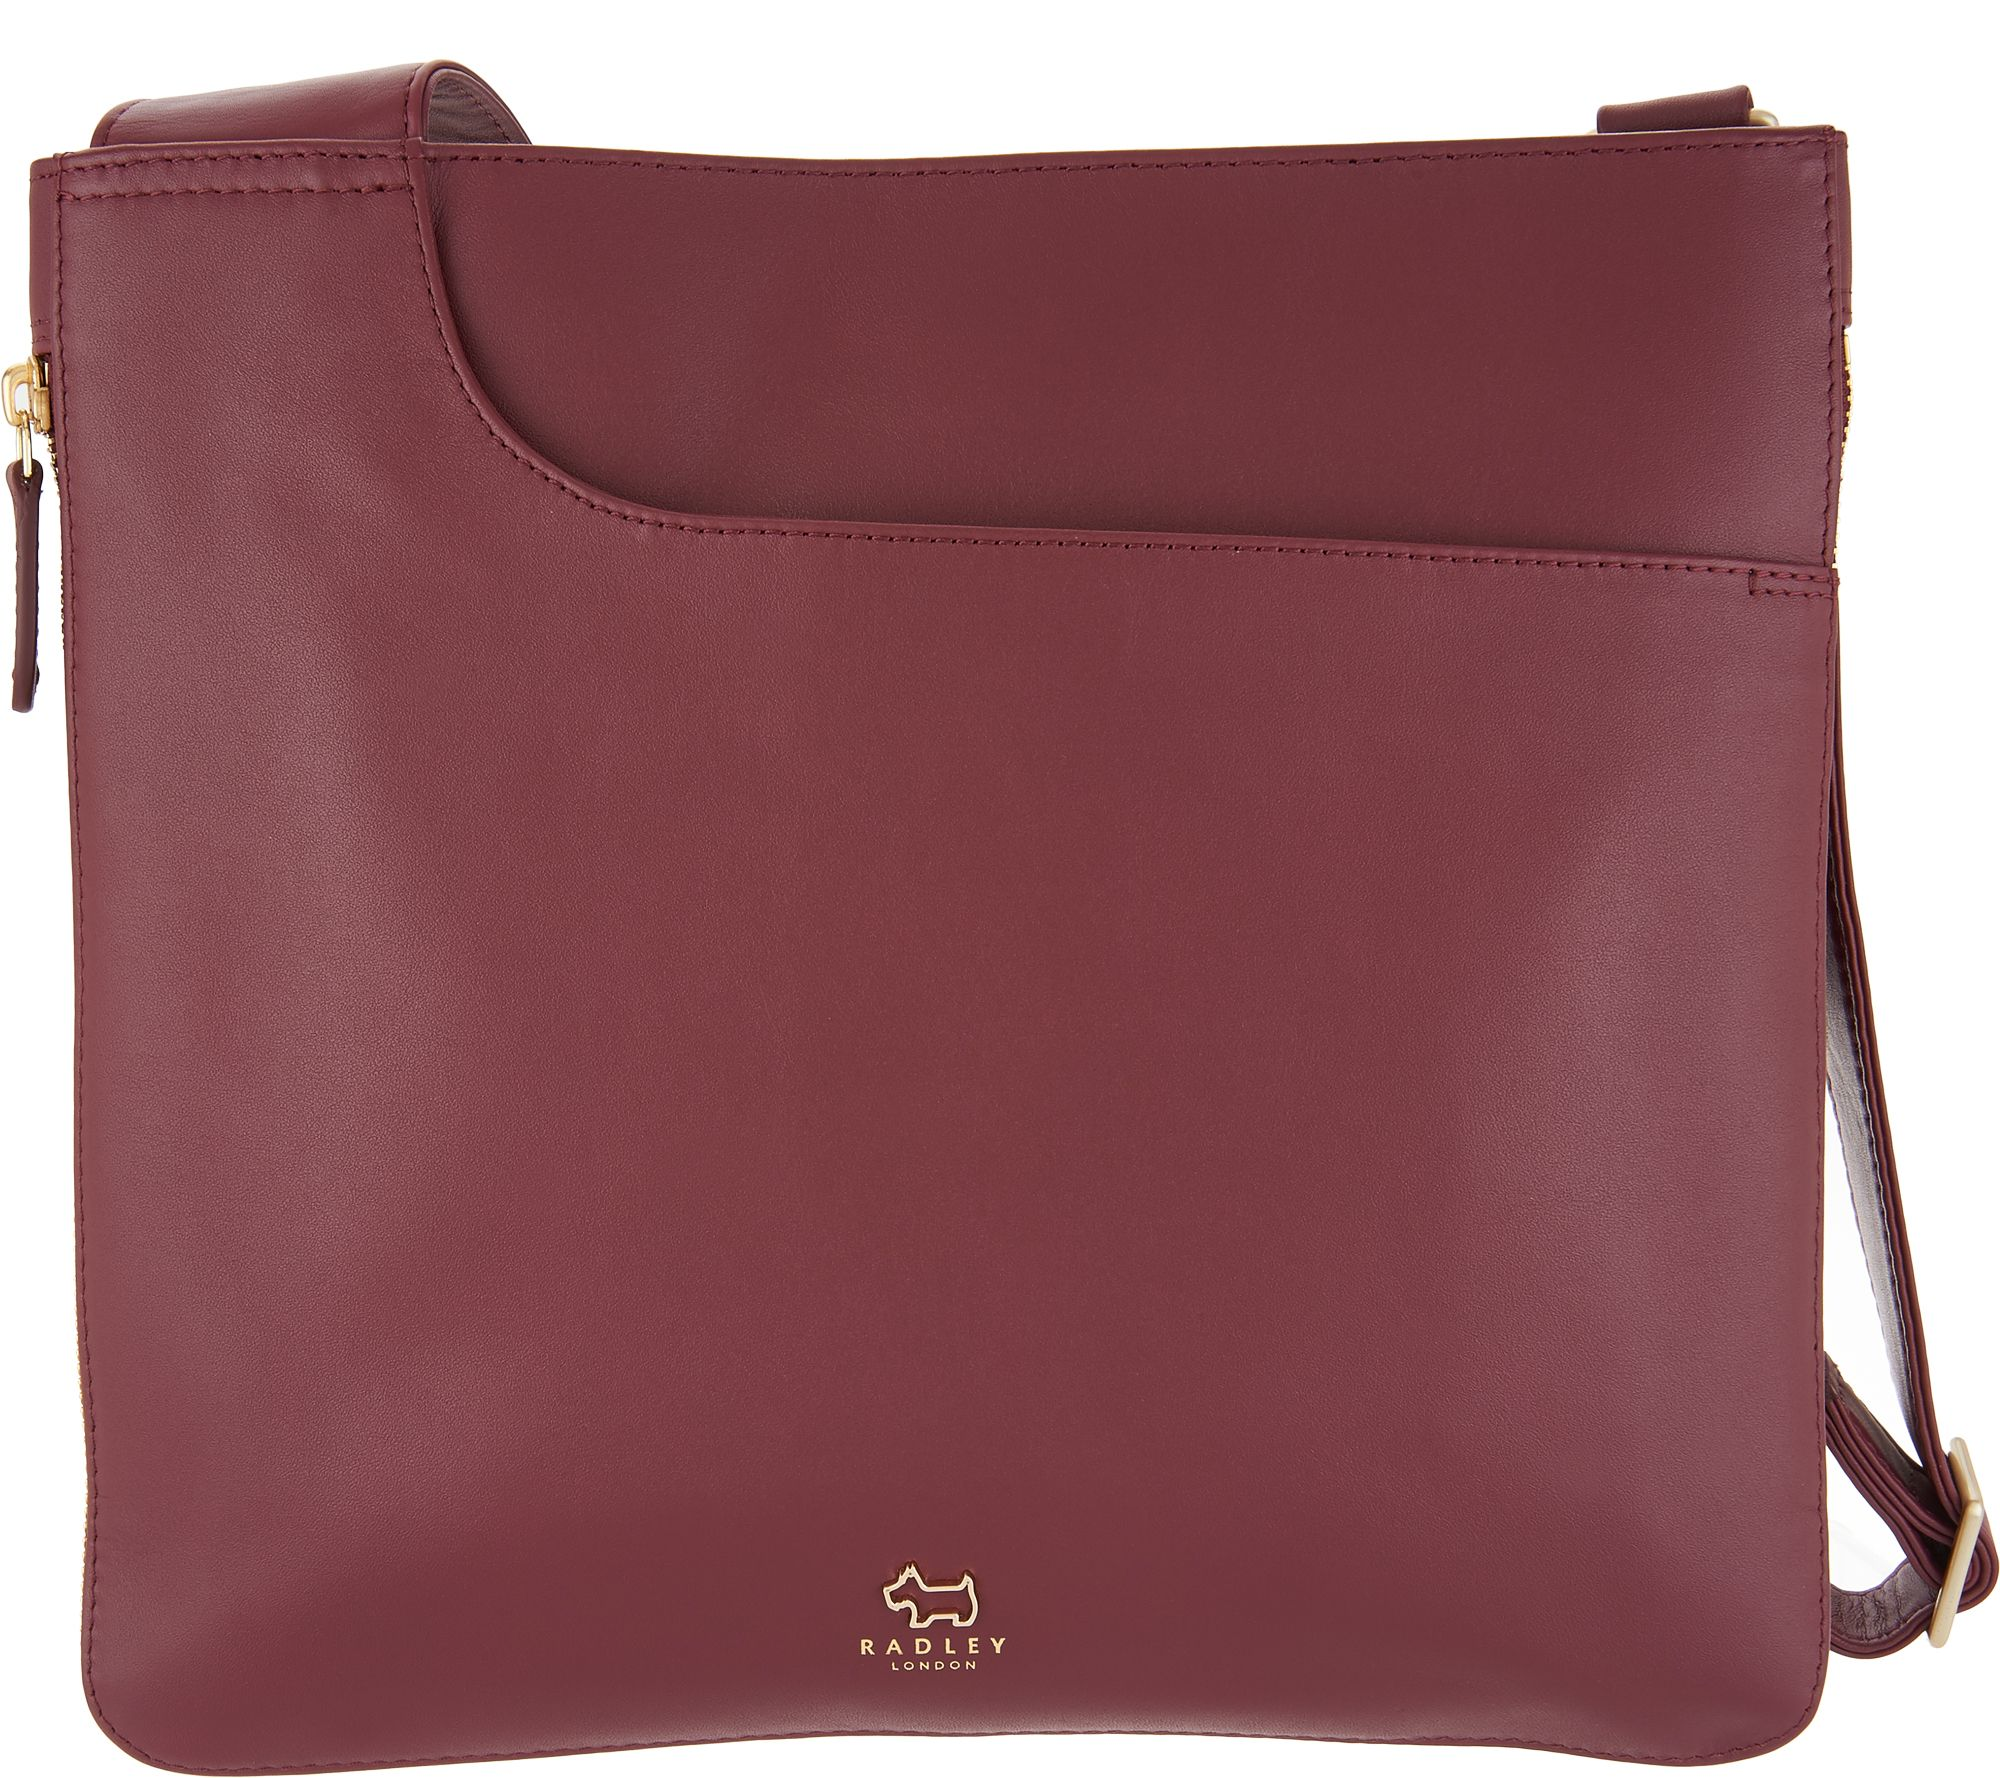 72168f24ddaf09 RADLEY London Pocket Leather Large Zip-Top Crossbody - Page 1 — QVC.com